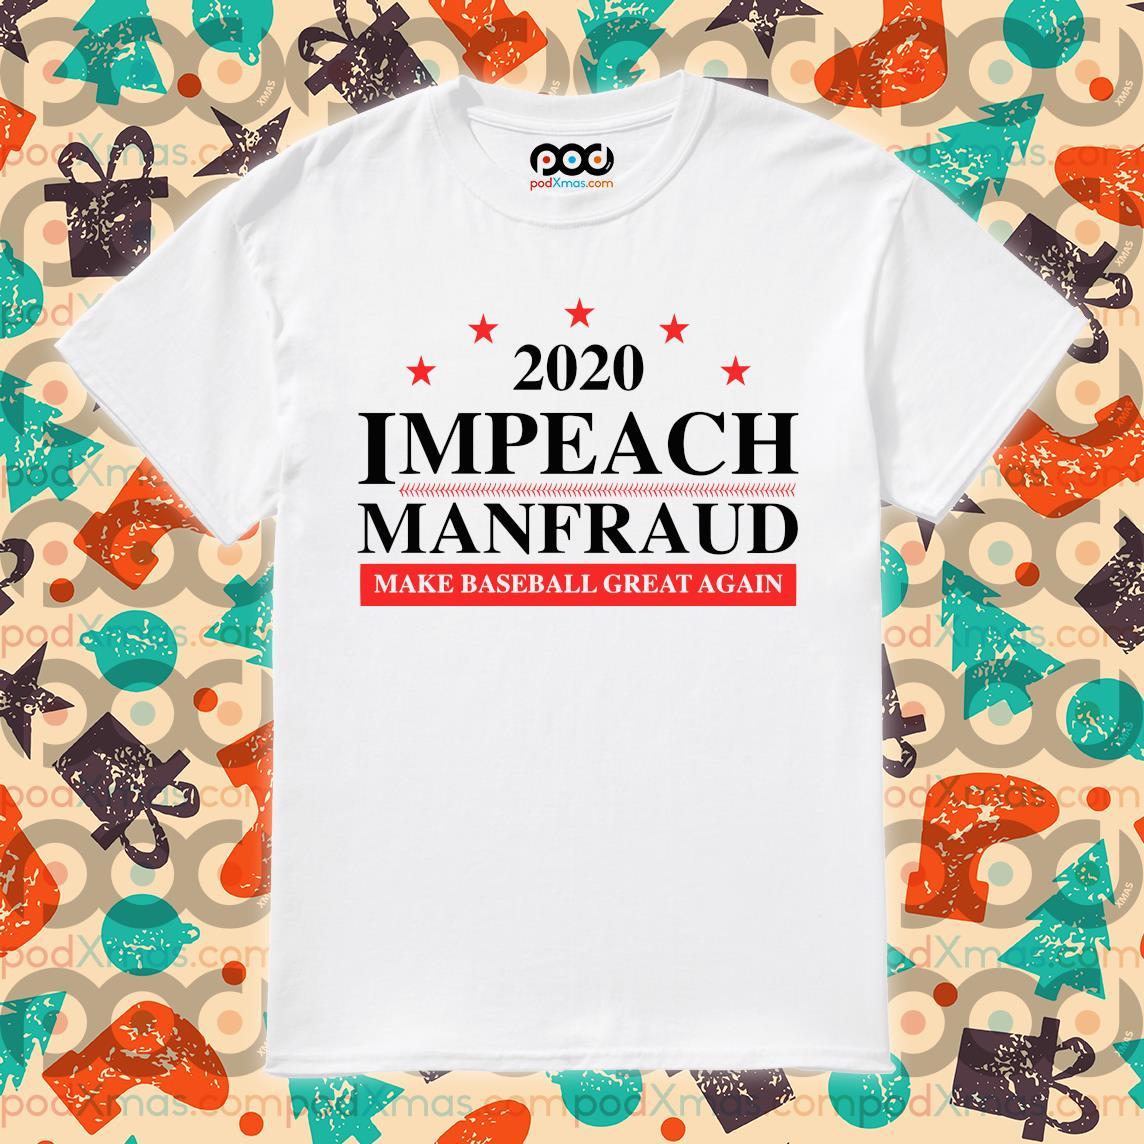 2020 Impeach manfred make baseball great again shirt